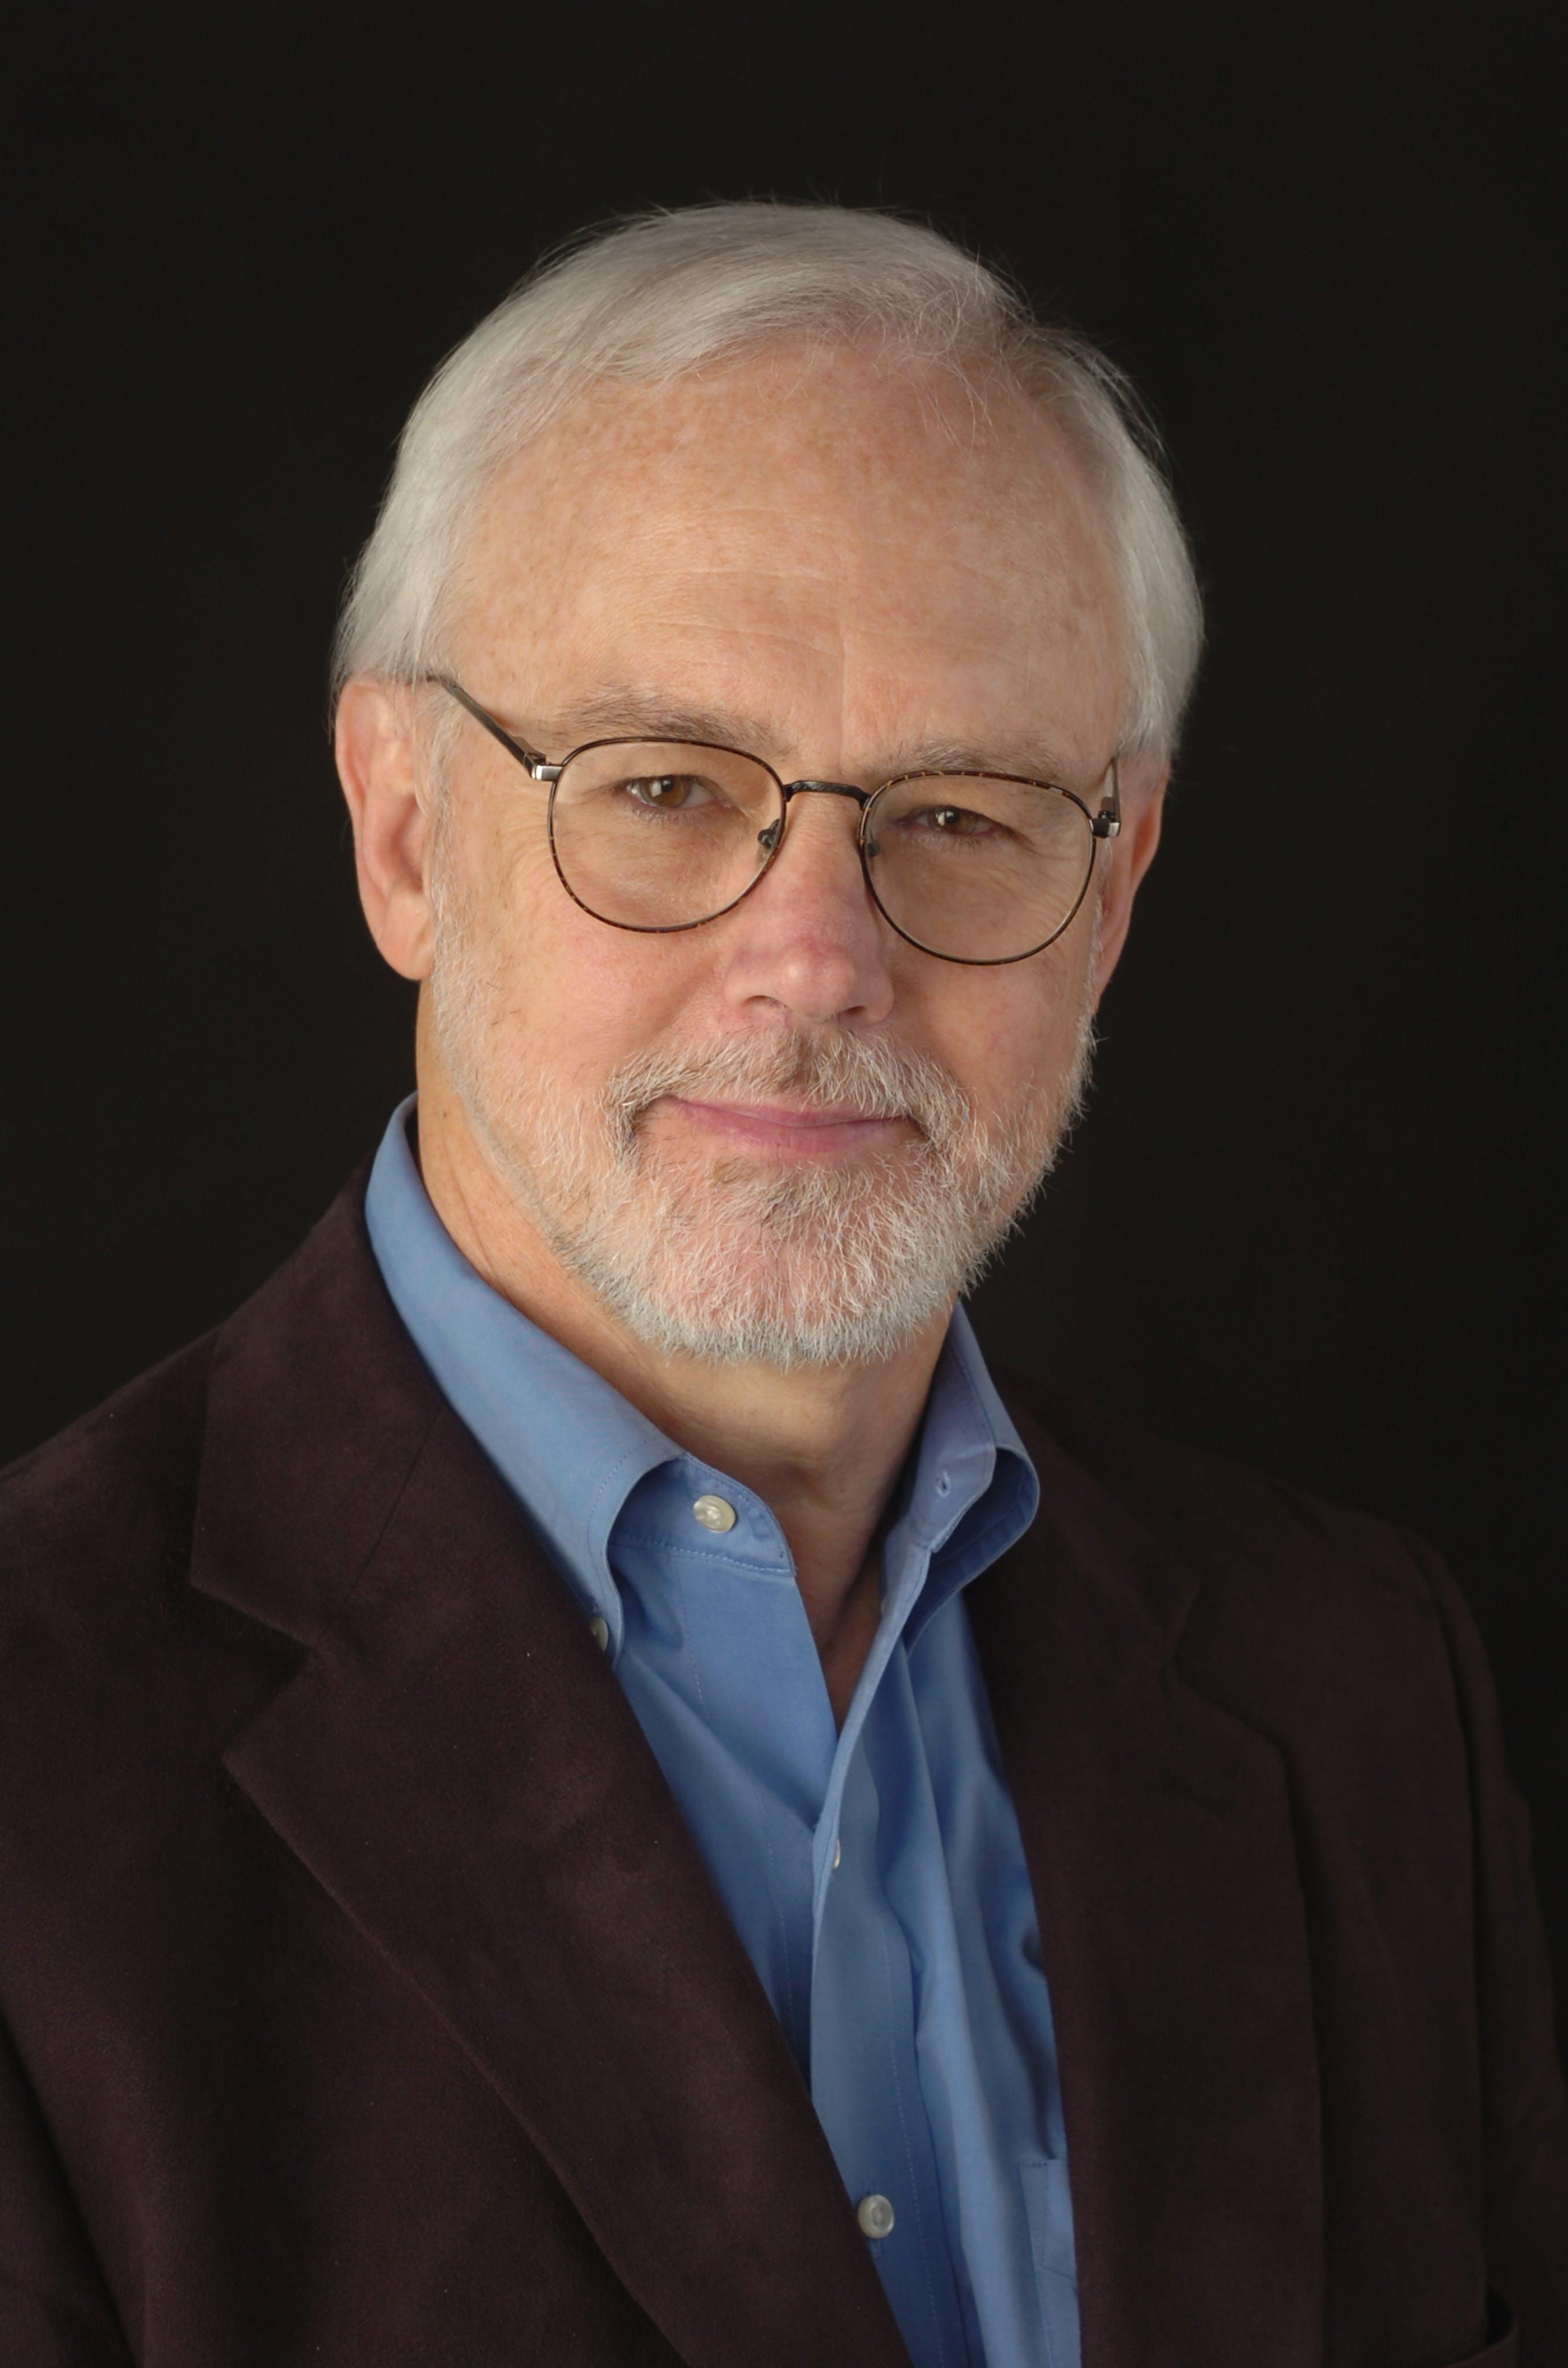 UB Professor to Receive 2009 Schoellkopf Award